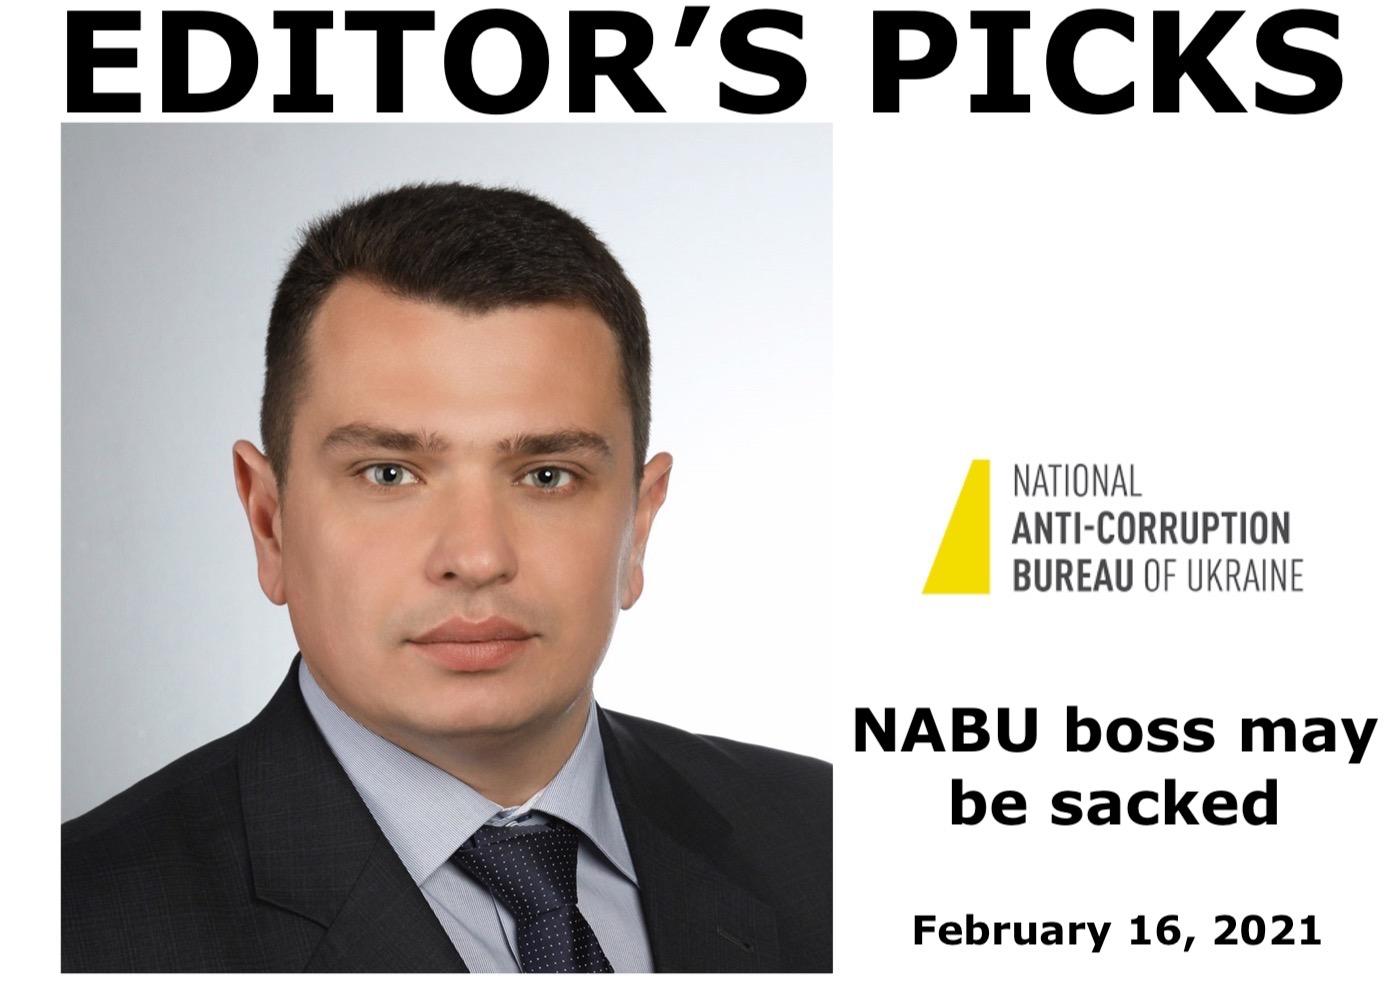 bne IntelliNews Editor's Picks --  Ukraine's Rada votes through bill to dismiss anti-corruption investigator NABU's director